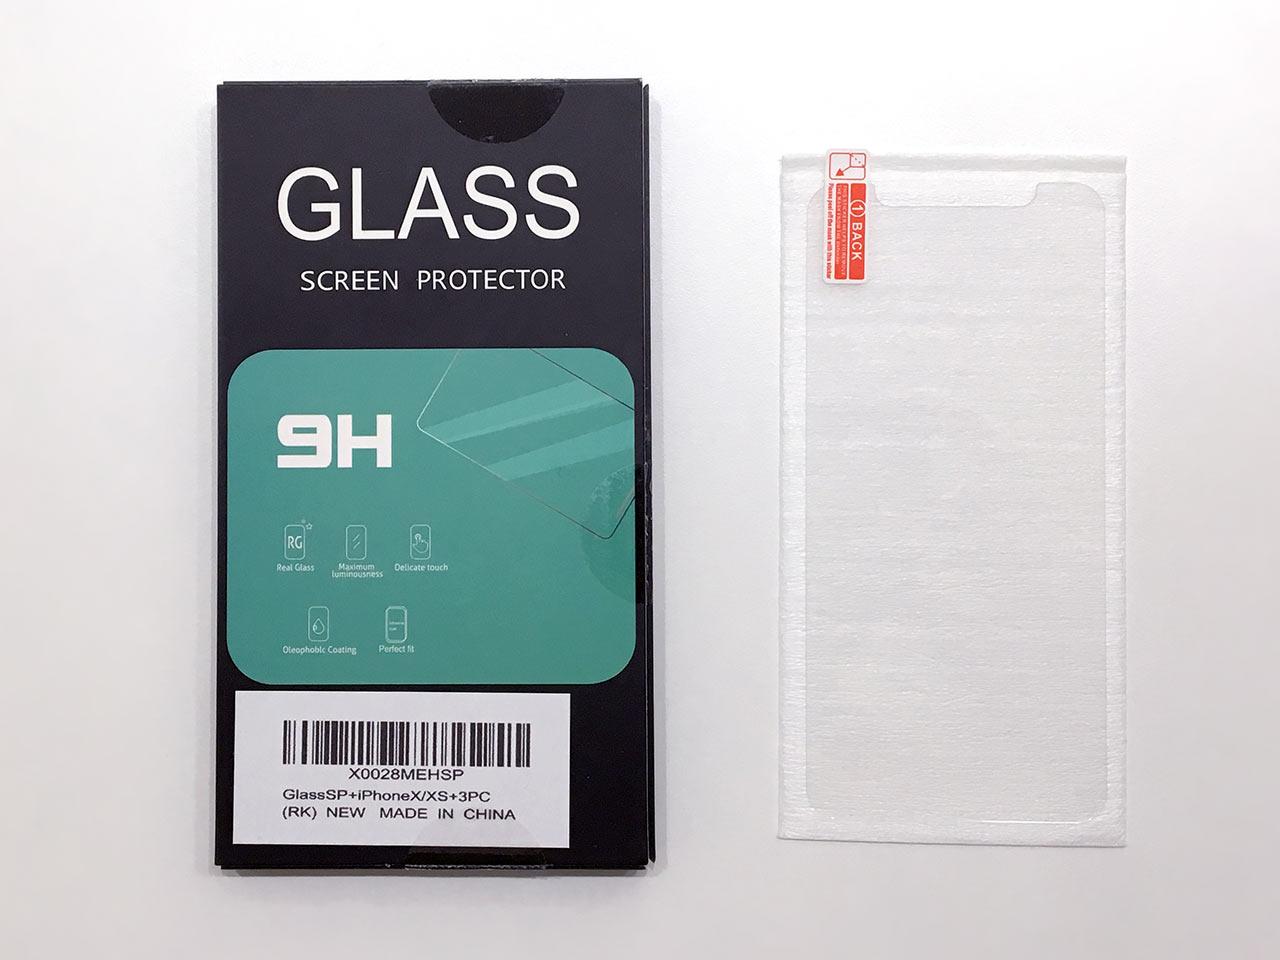 wearables_screen-protector-package.jpg